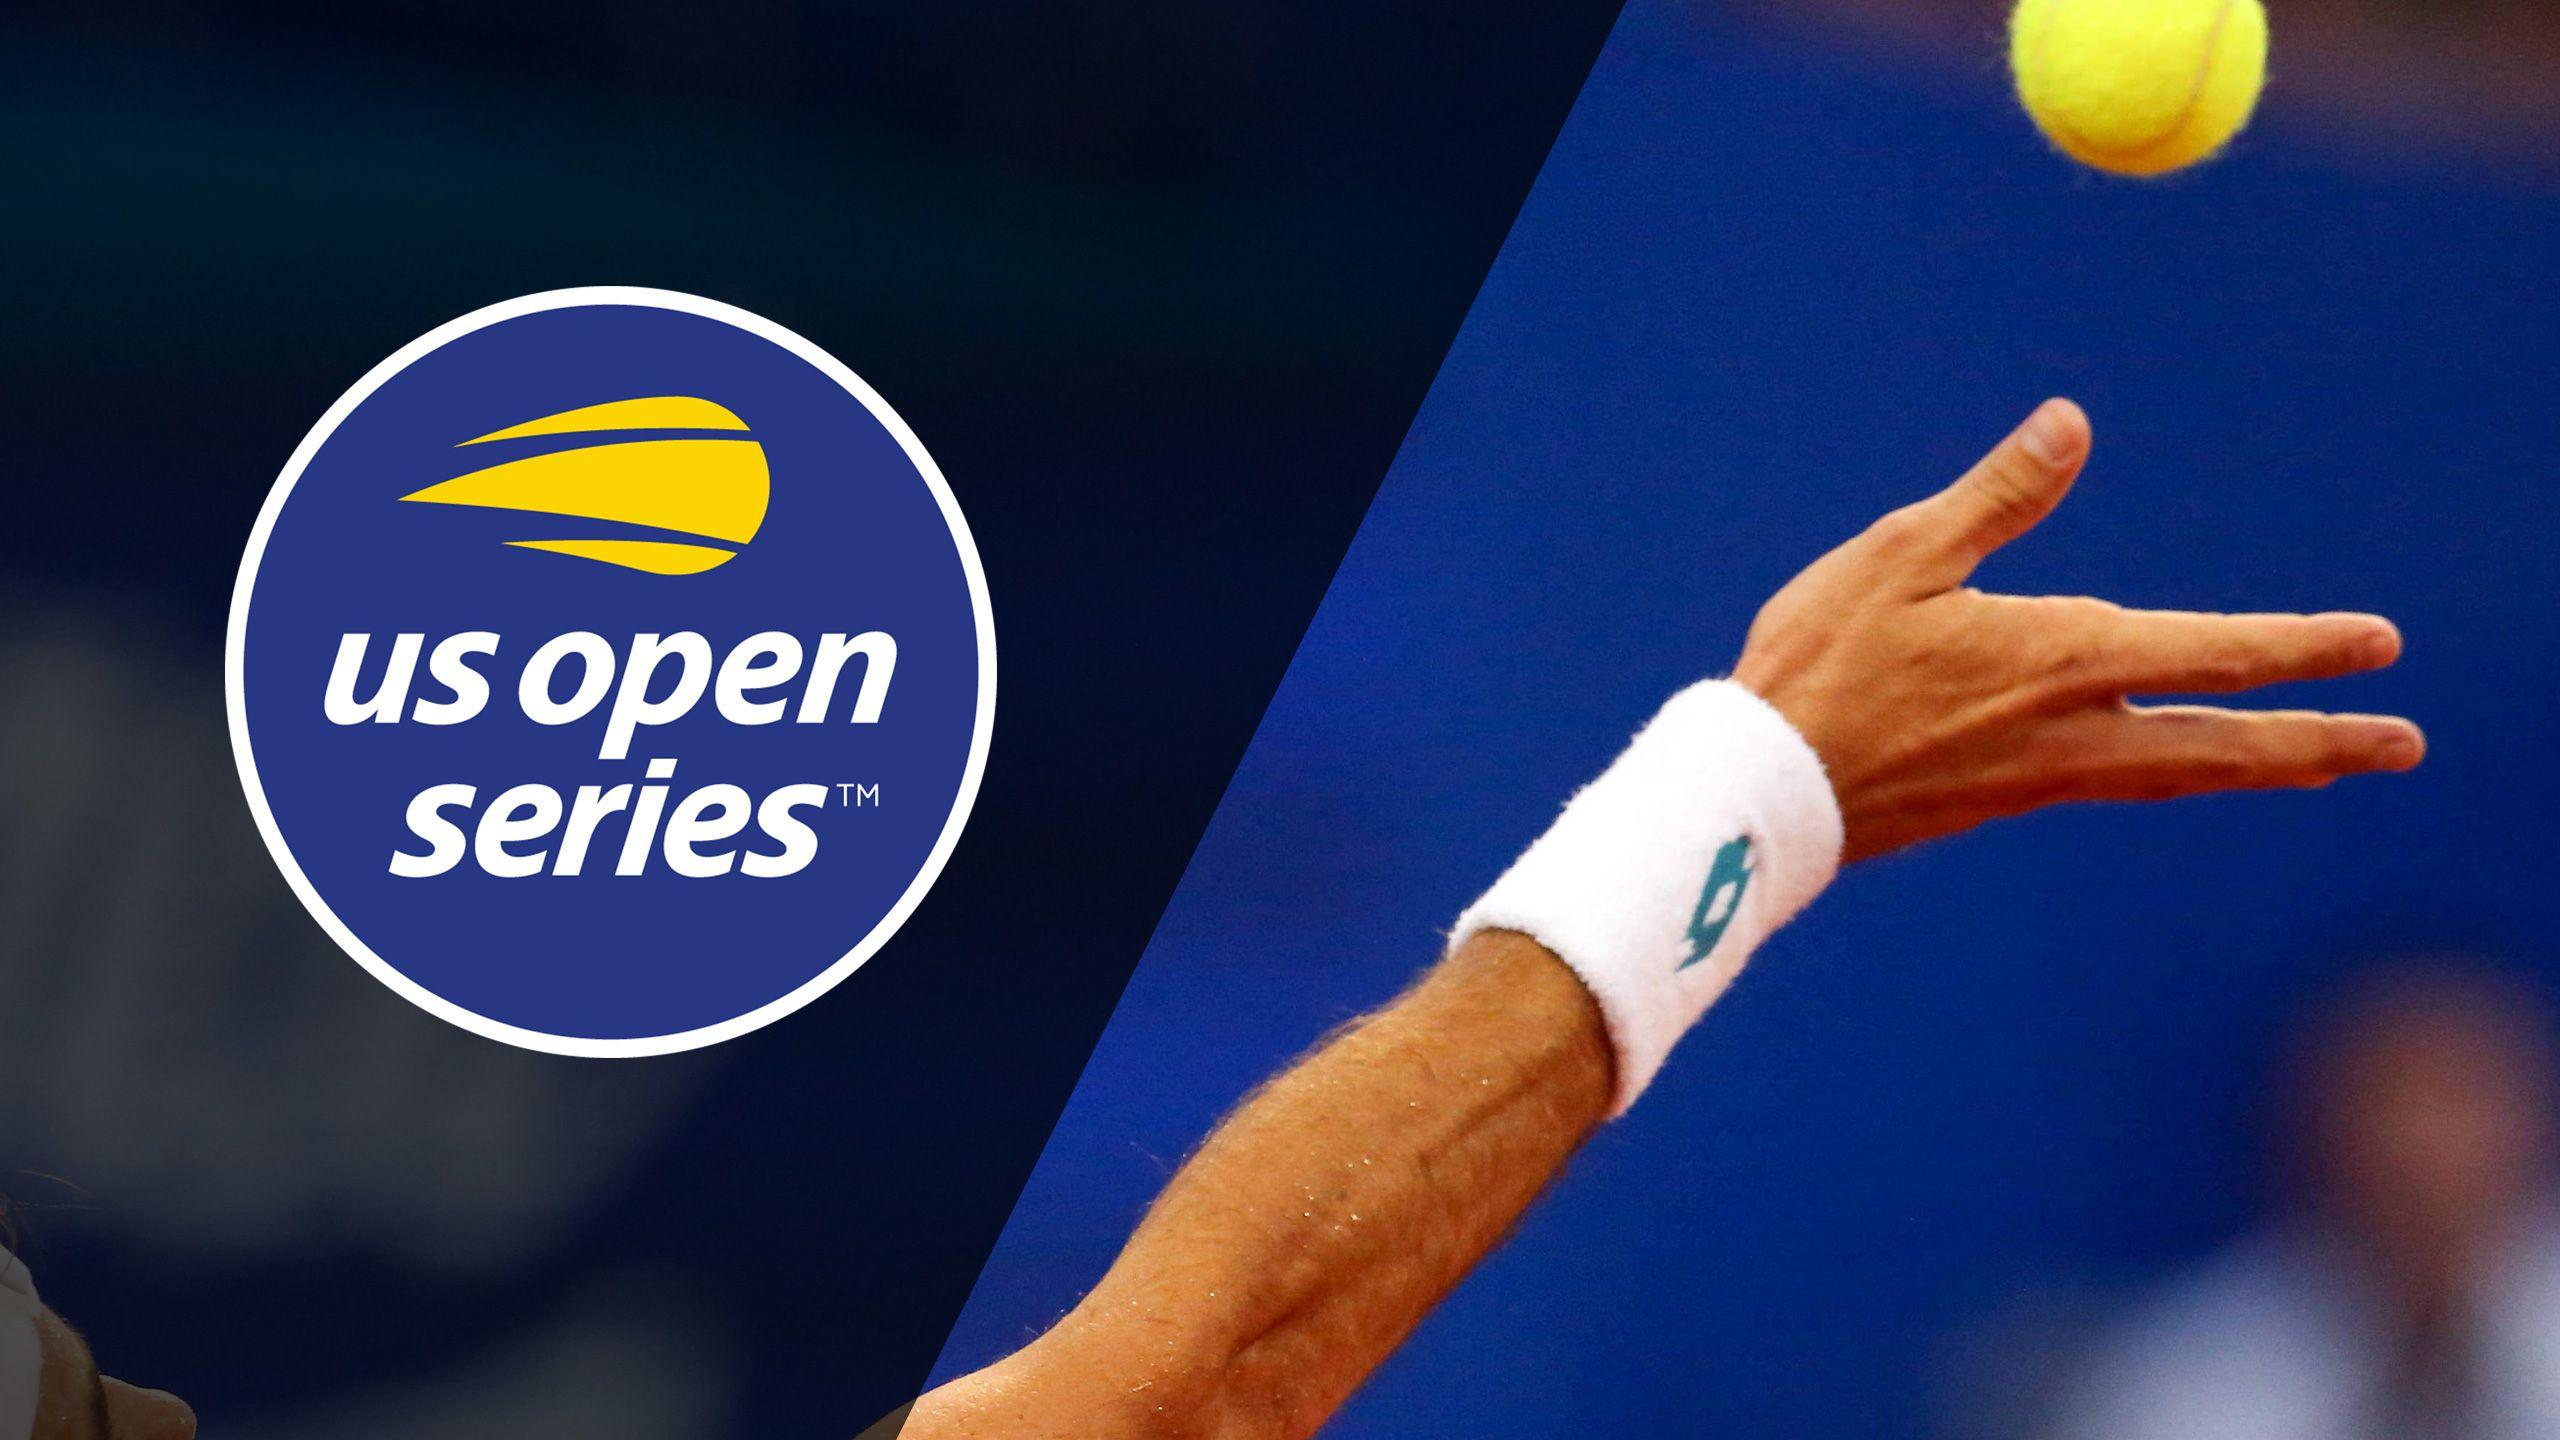 2018 US Open Series - BB&T Atlanta Open (Semifinal #1)